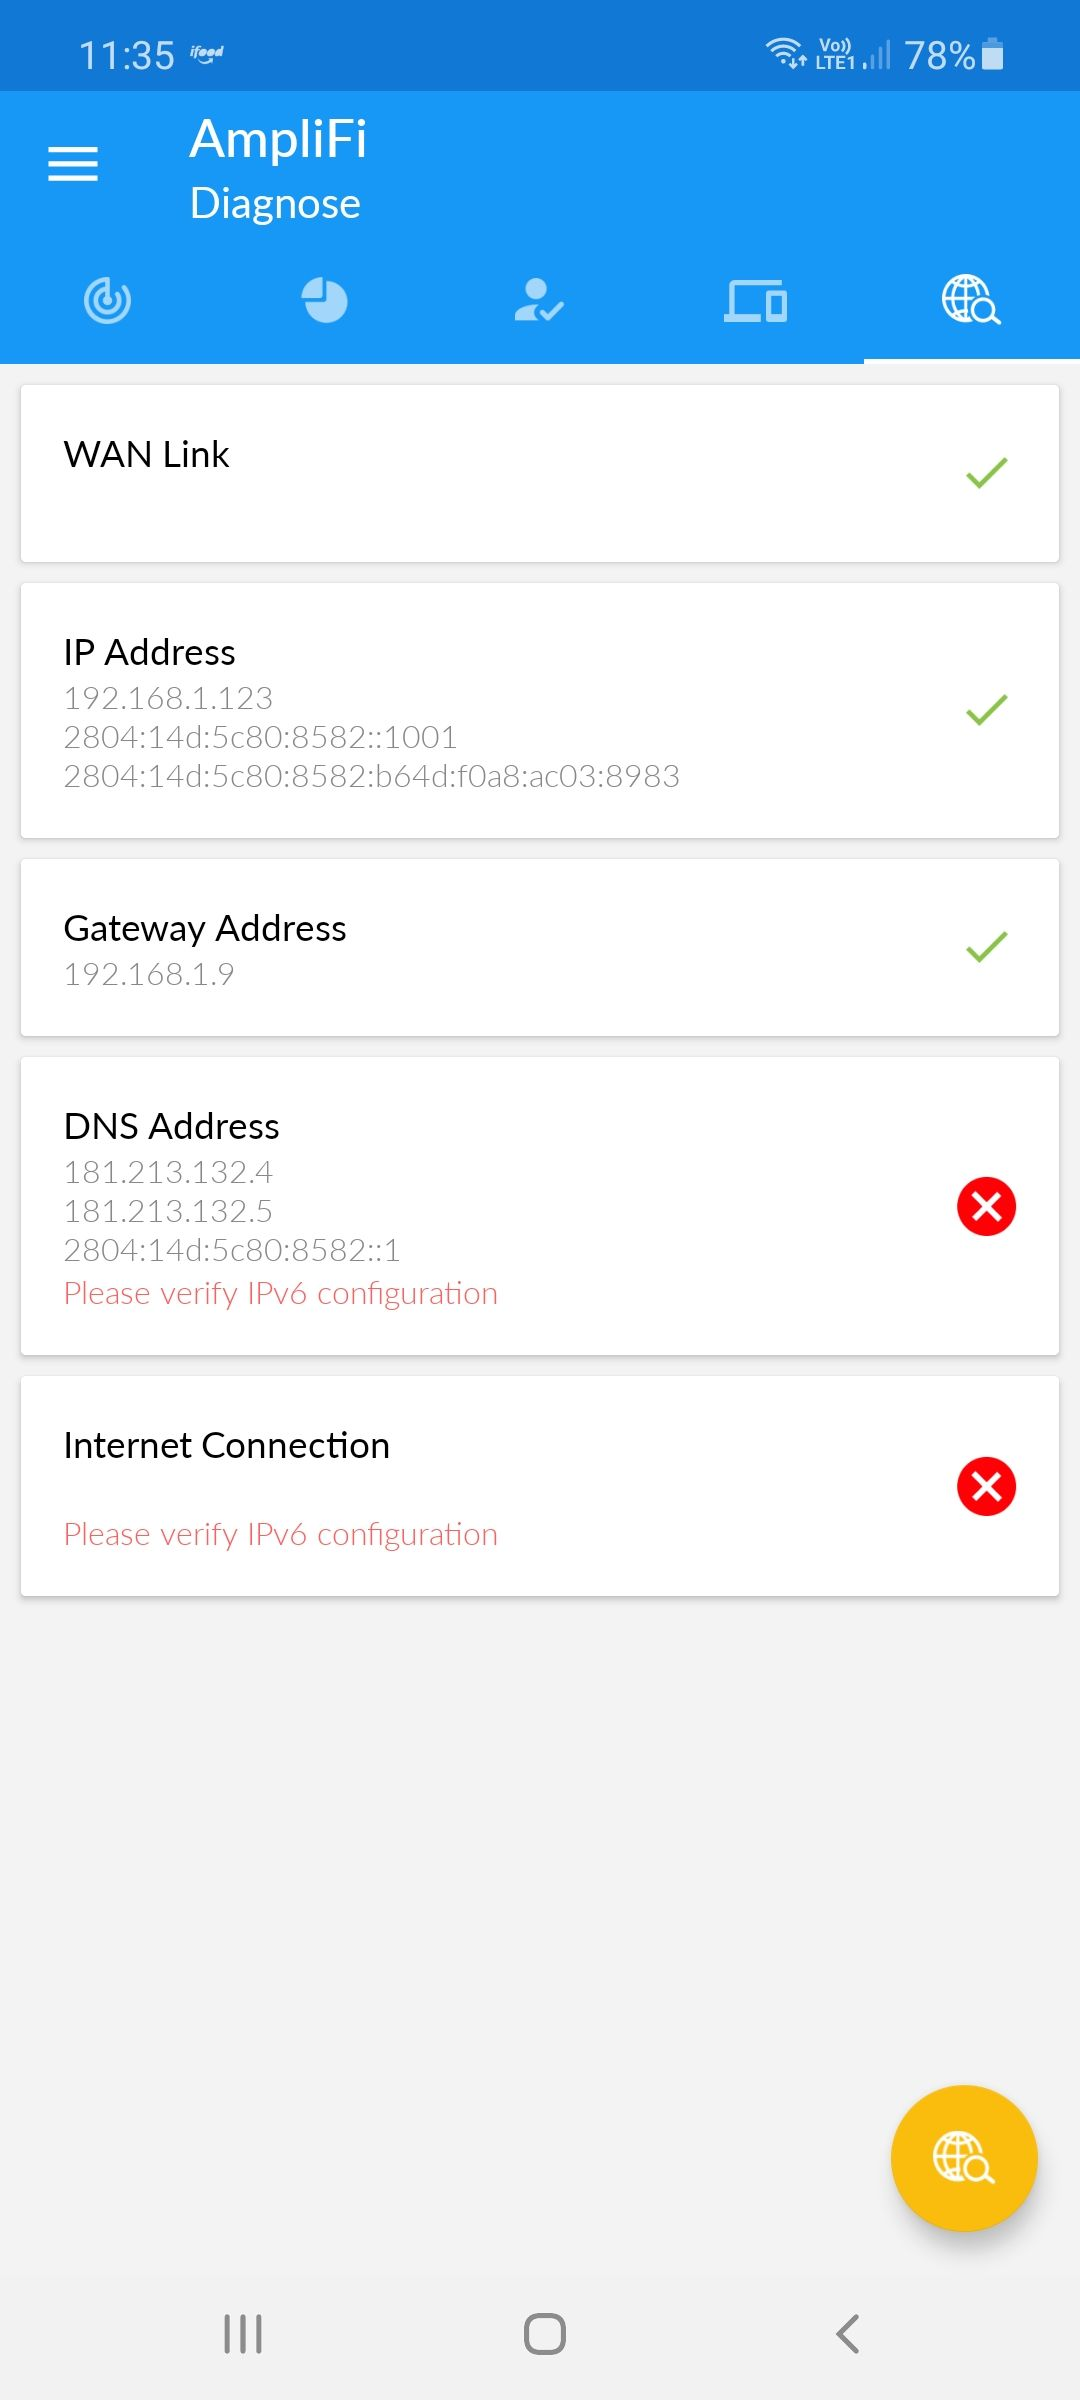 0_1608207390877_AmpliFi IPV6 issues.jpg